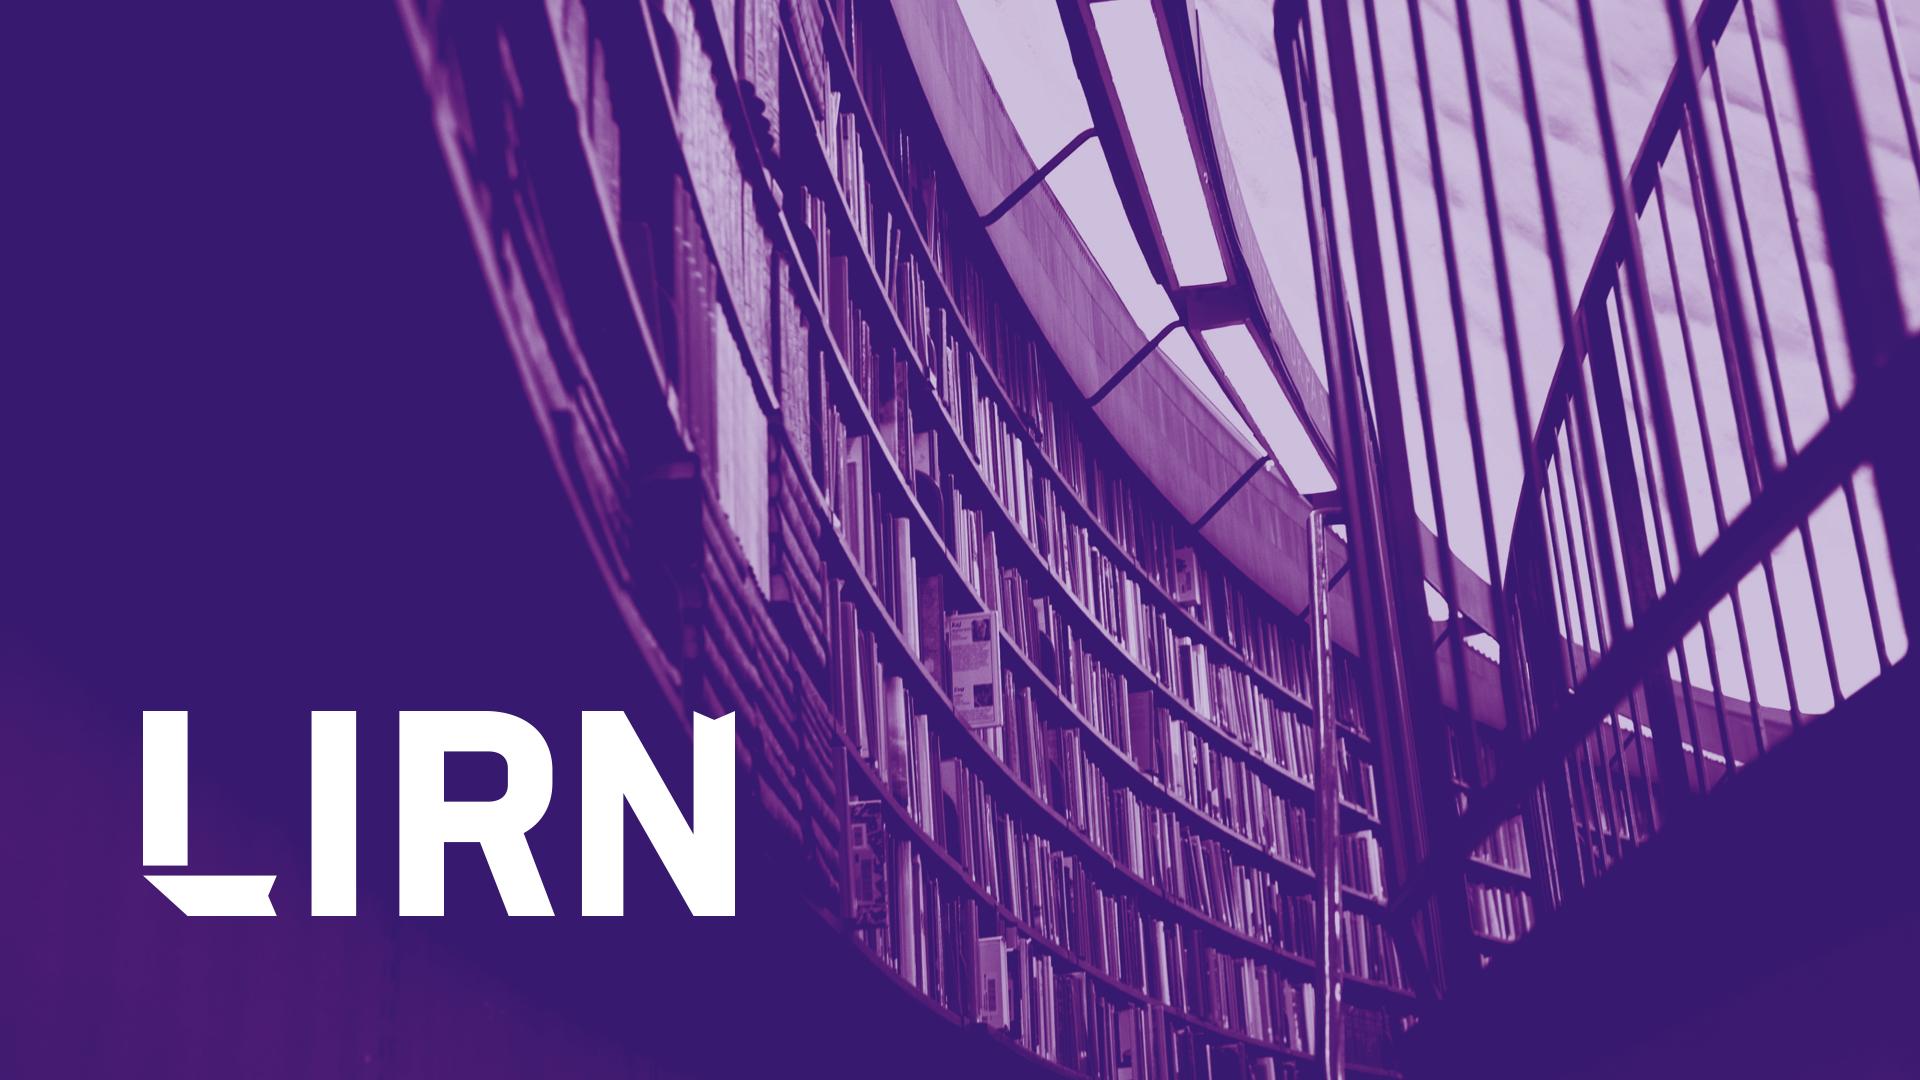 LIRN_header image